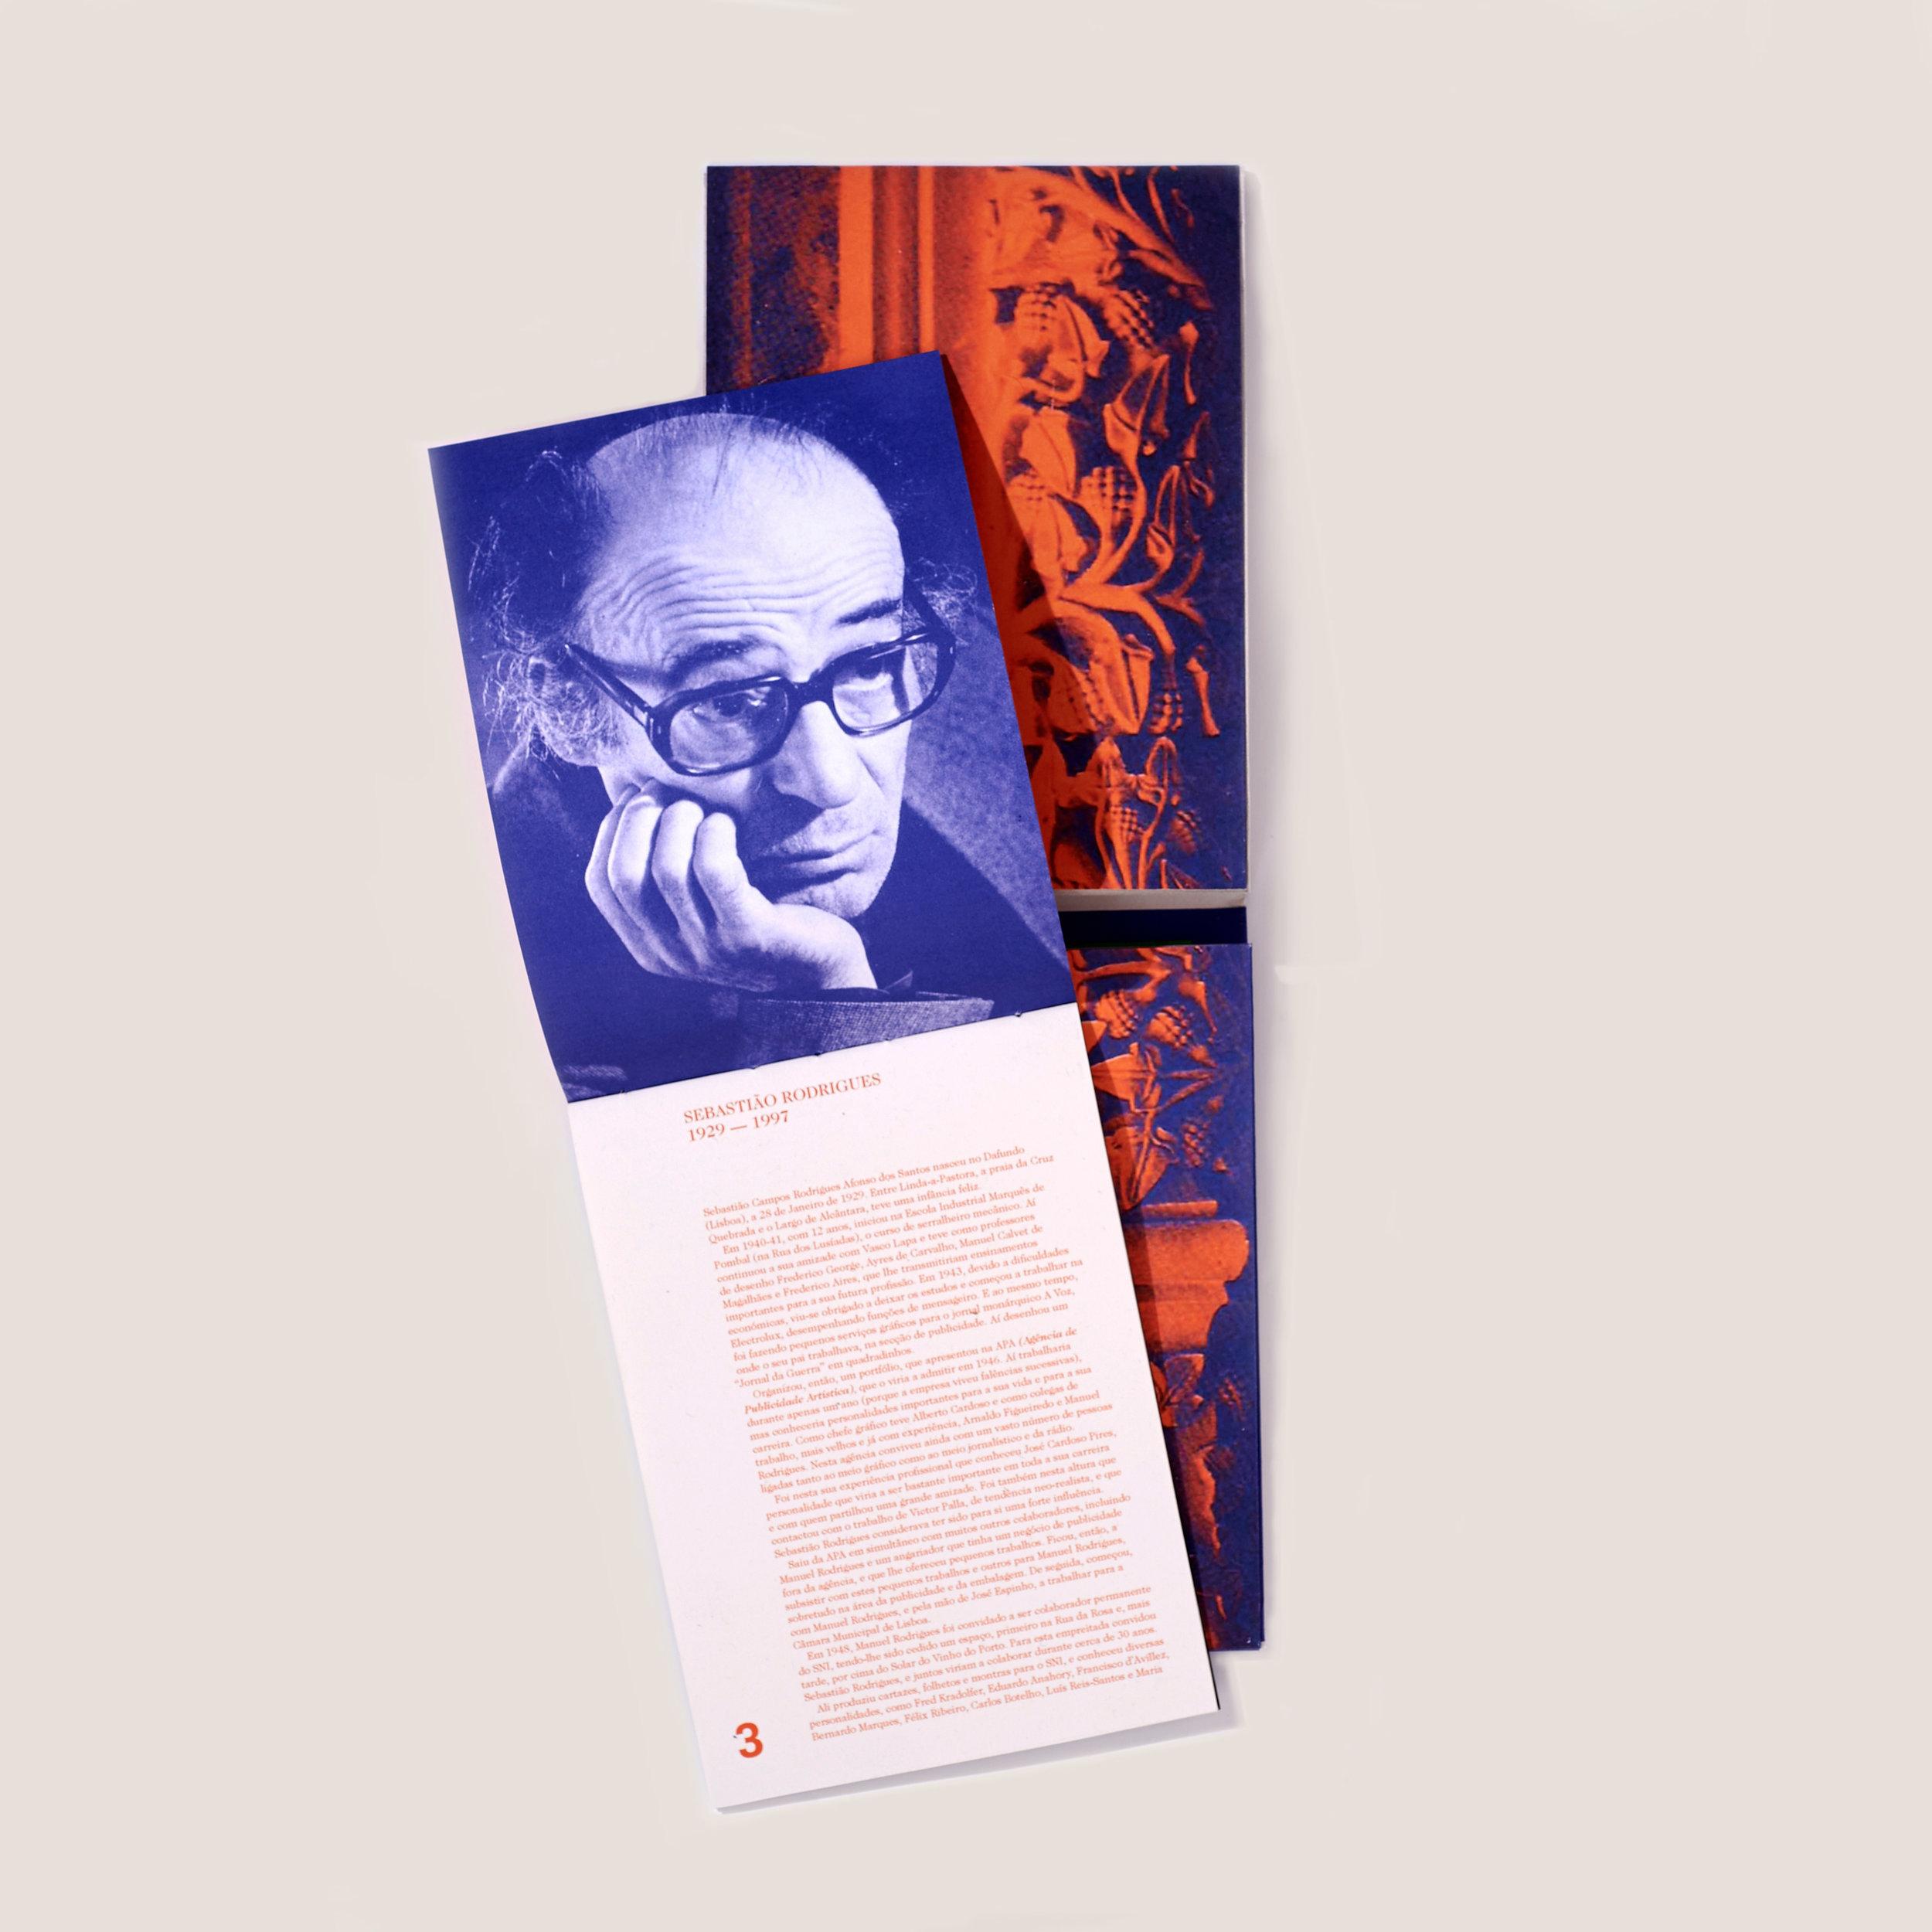 #3 - Precursor / Design Concept for Print and Digital Repository of Portuguese Art and Architecture / Illustration: Sebastião Rodrigues